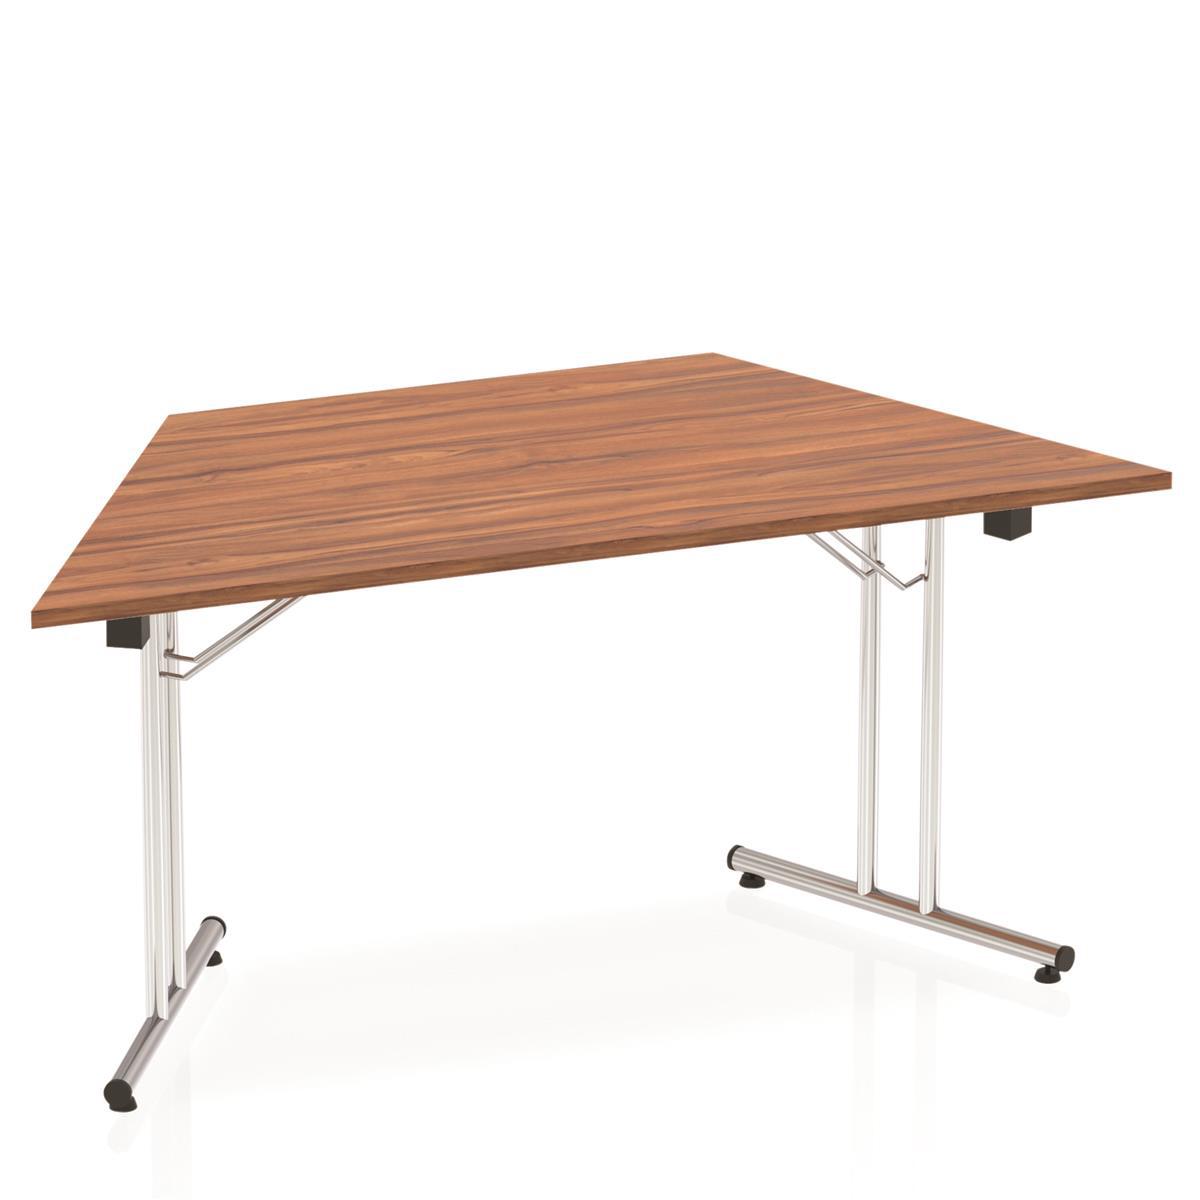 Sonix Trapezoidal Chrome Leg Folding Meeting Table 1600x800mm Walnut ...